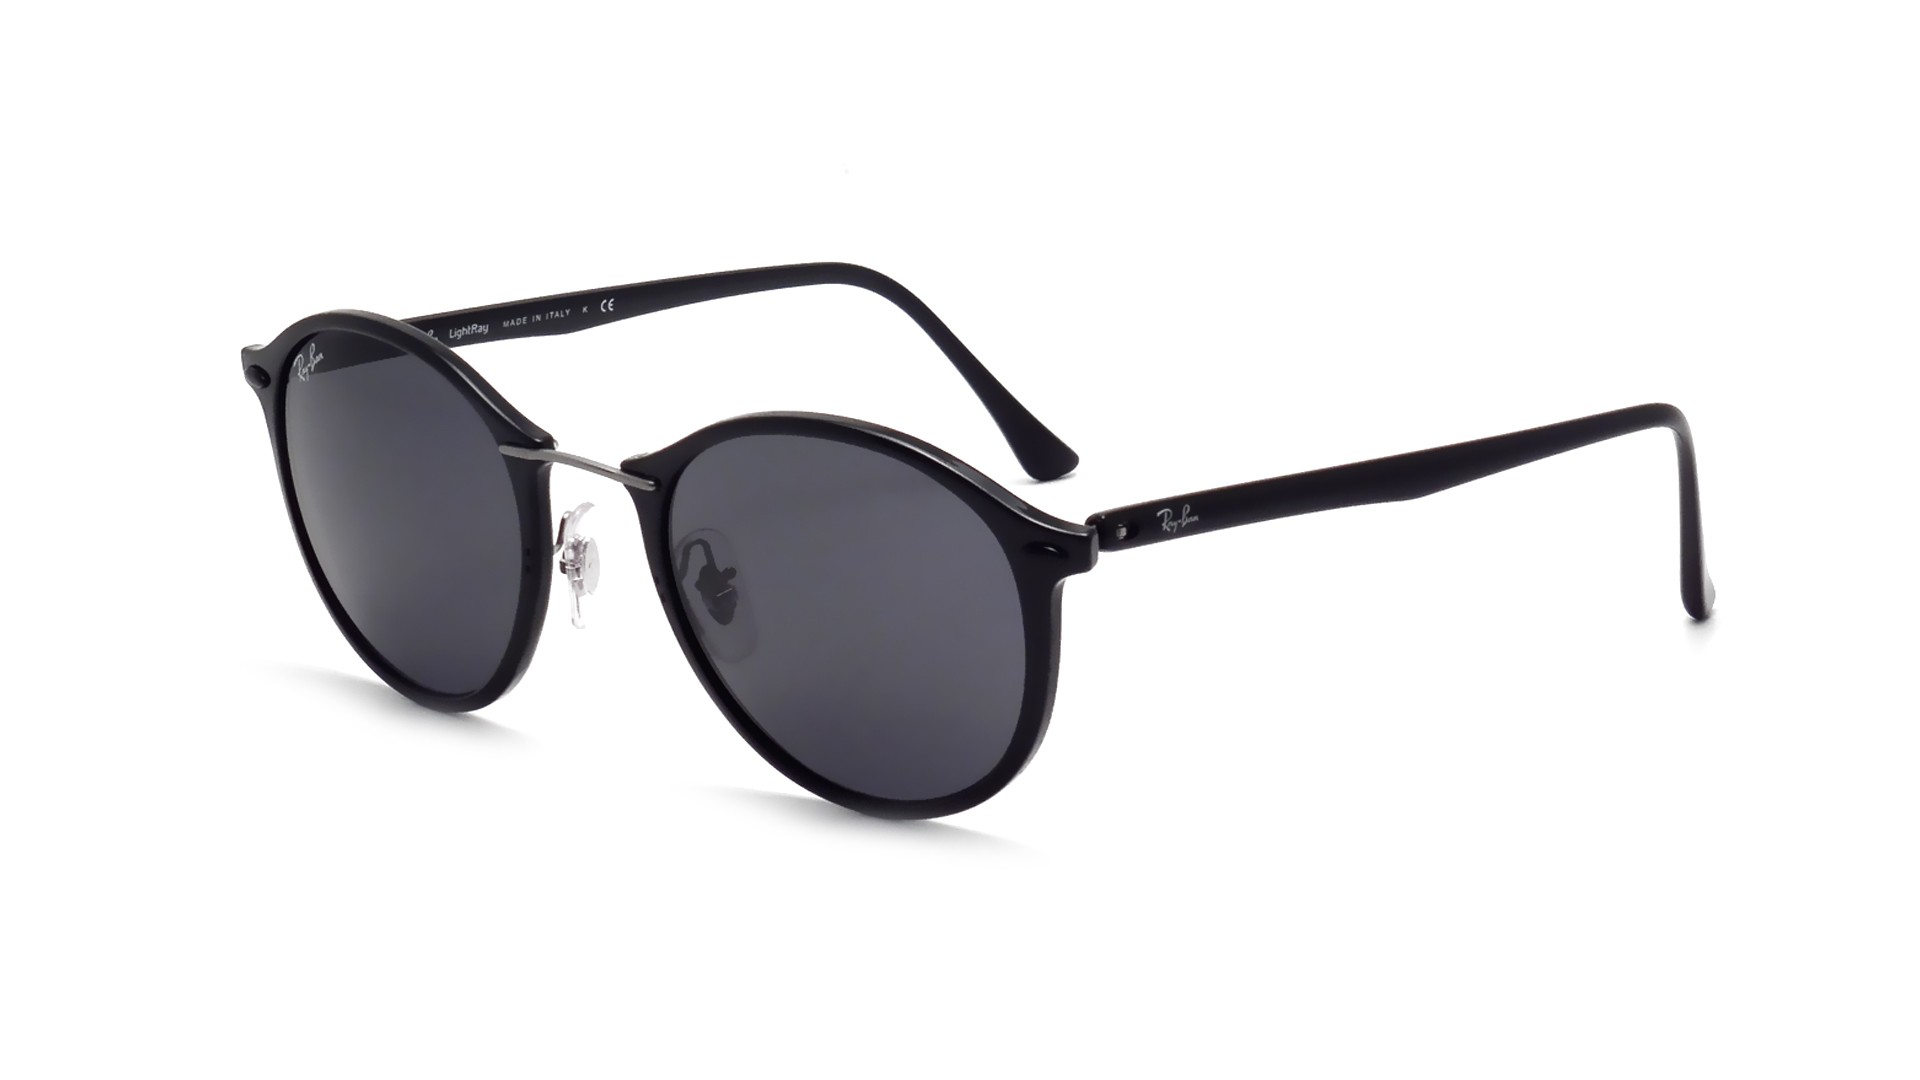 389bbf1bf5 ... spain sunglasses ray ban tech light ray tech black rb4242 601 71 49 21  medium fd6b0